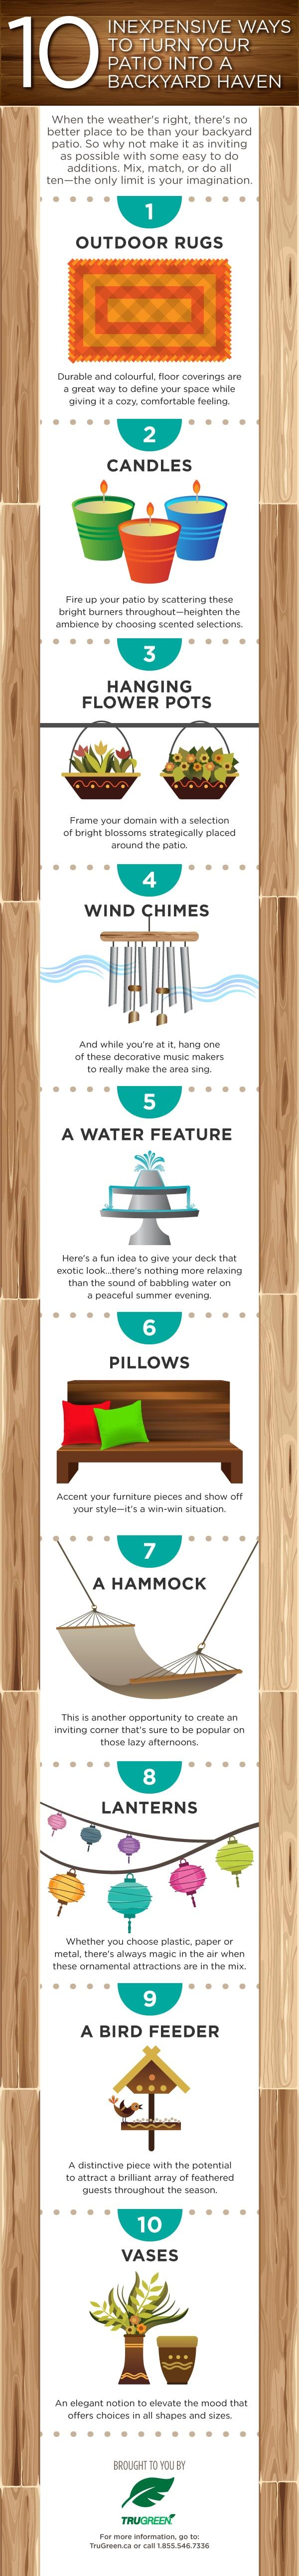 10 inexpensive ways to create a backyard oasis